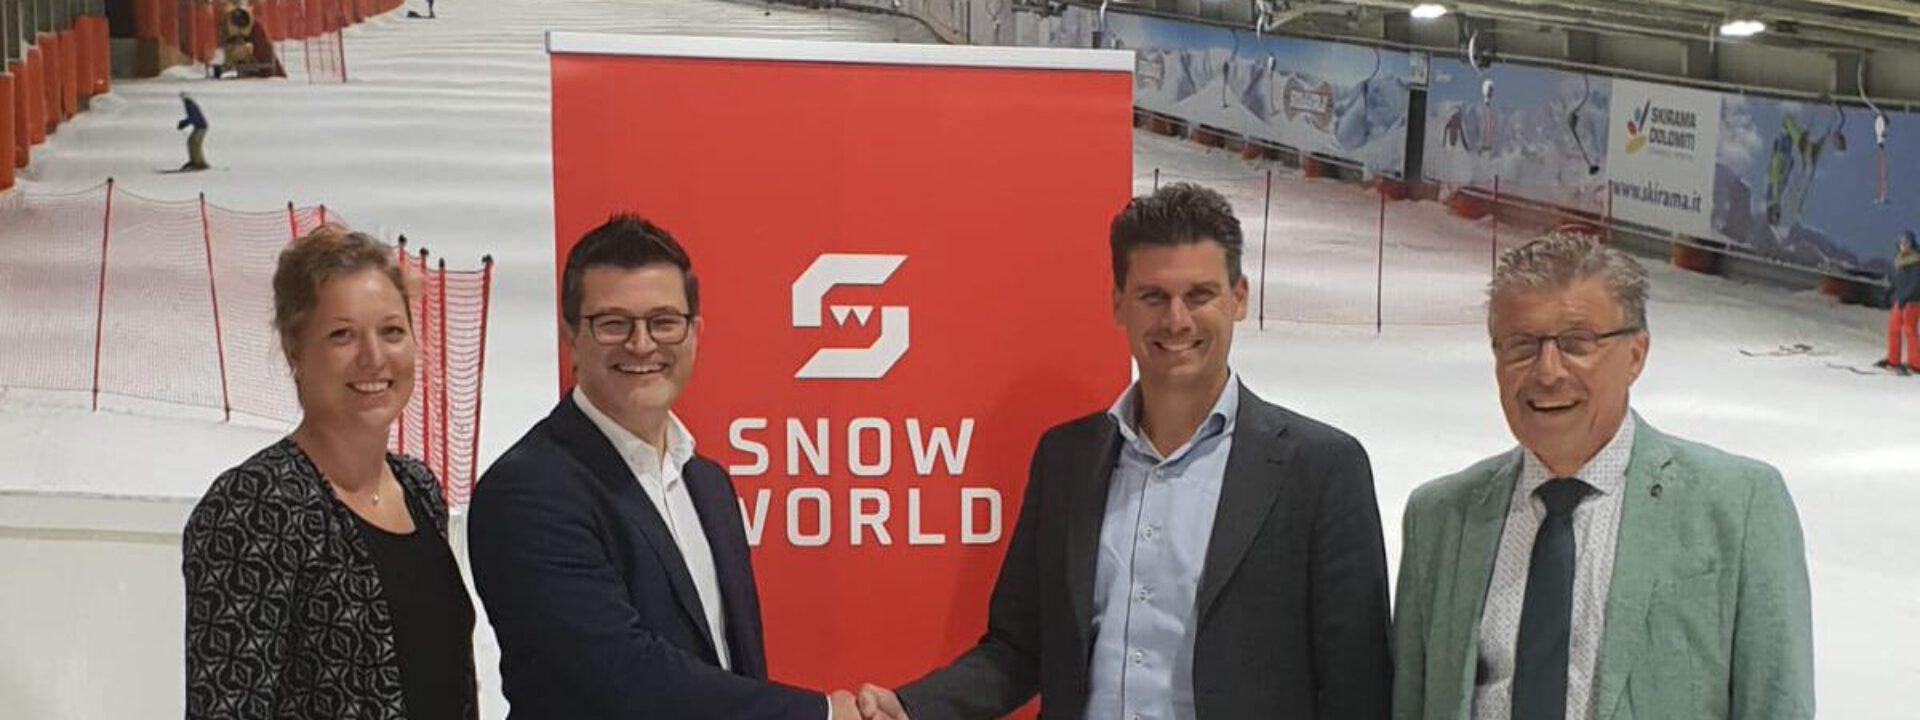 Snowworld Landgraaf kiest voor EW Facility Services